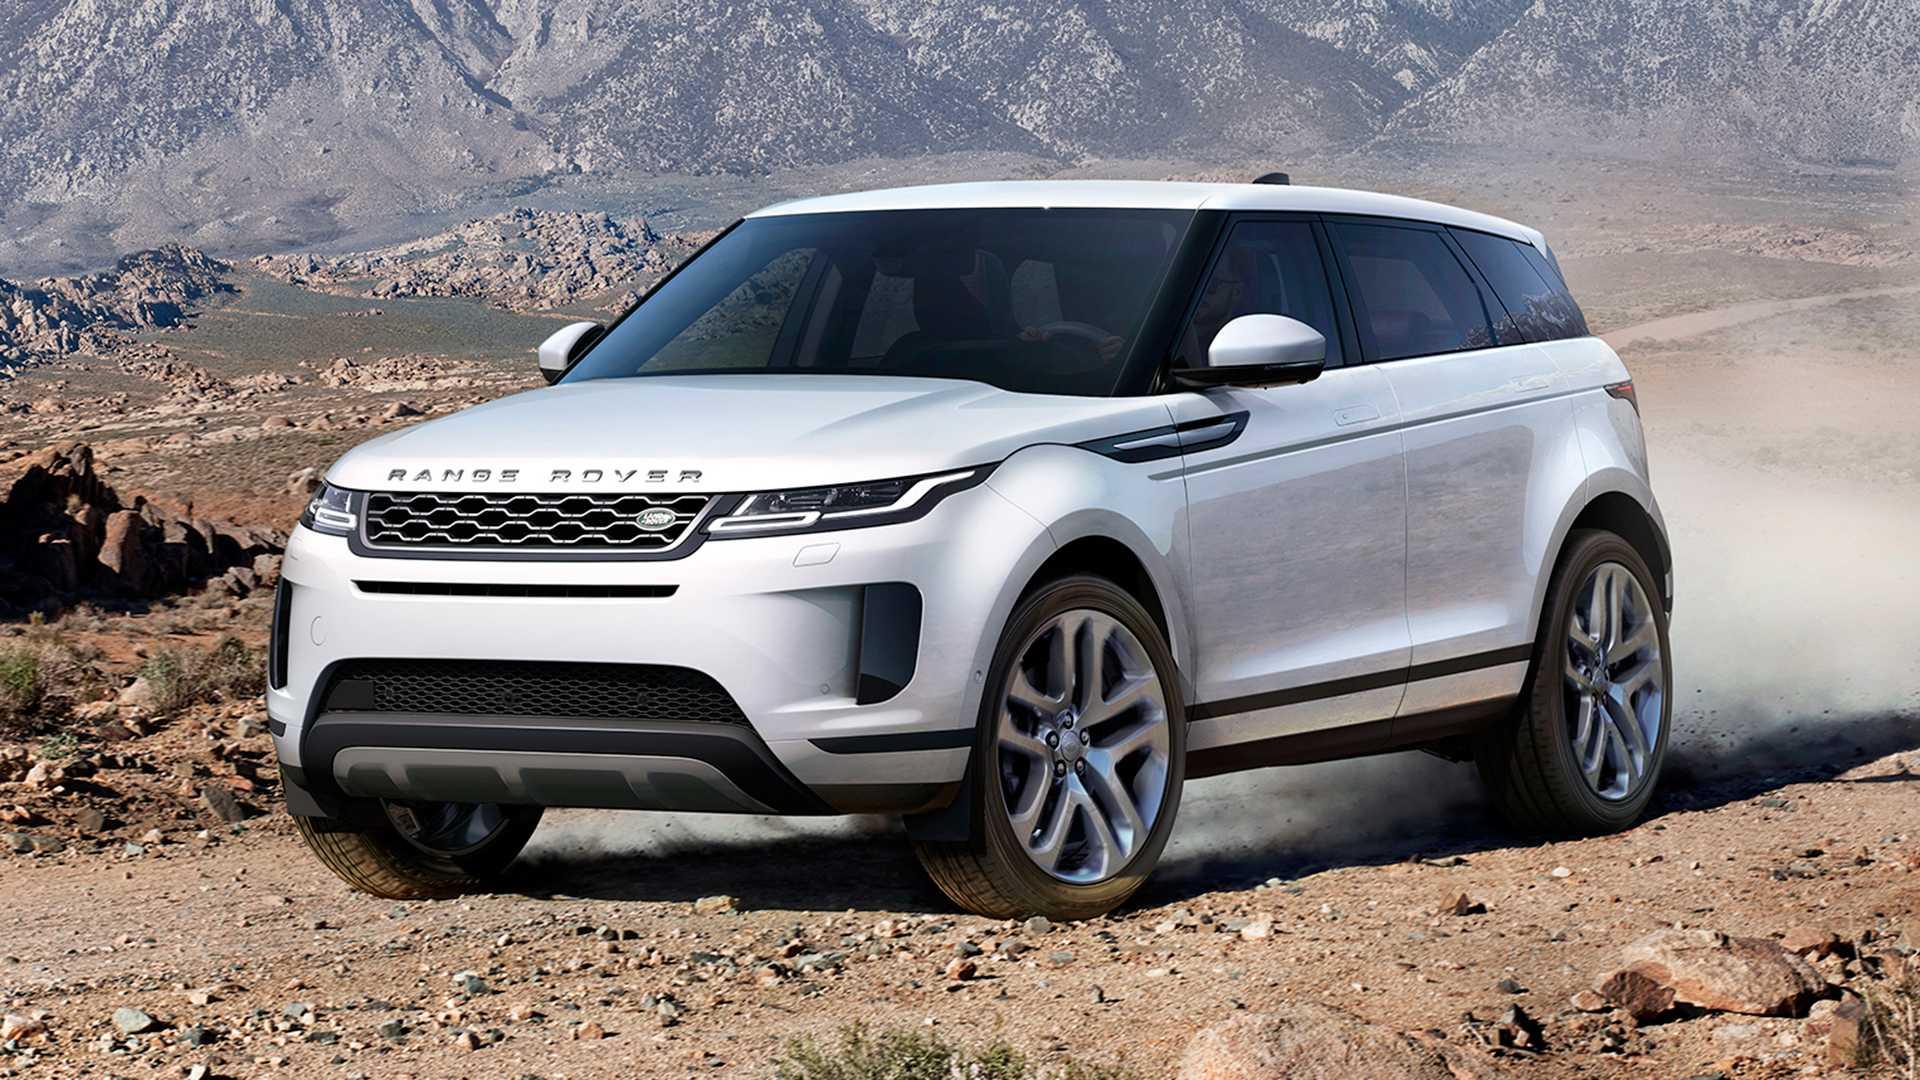 2020-range-rover-evoque (8)